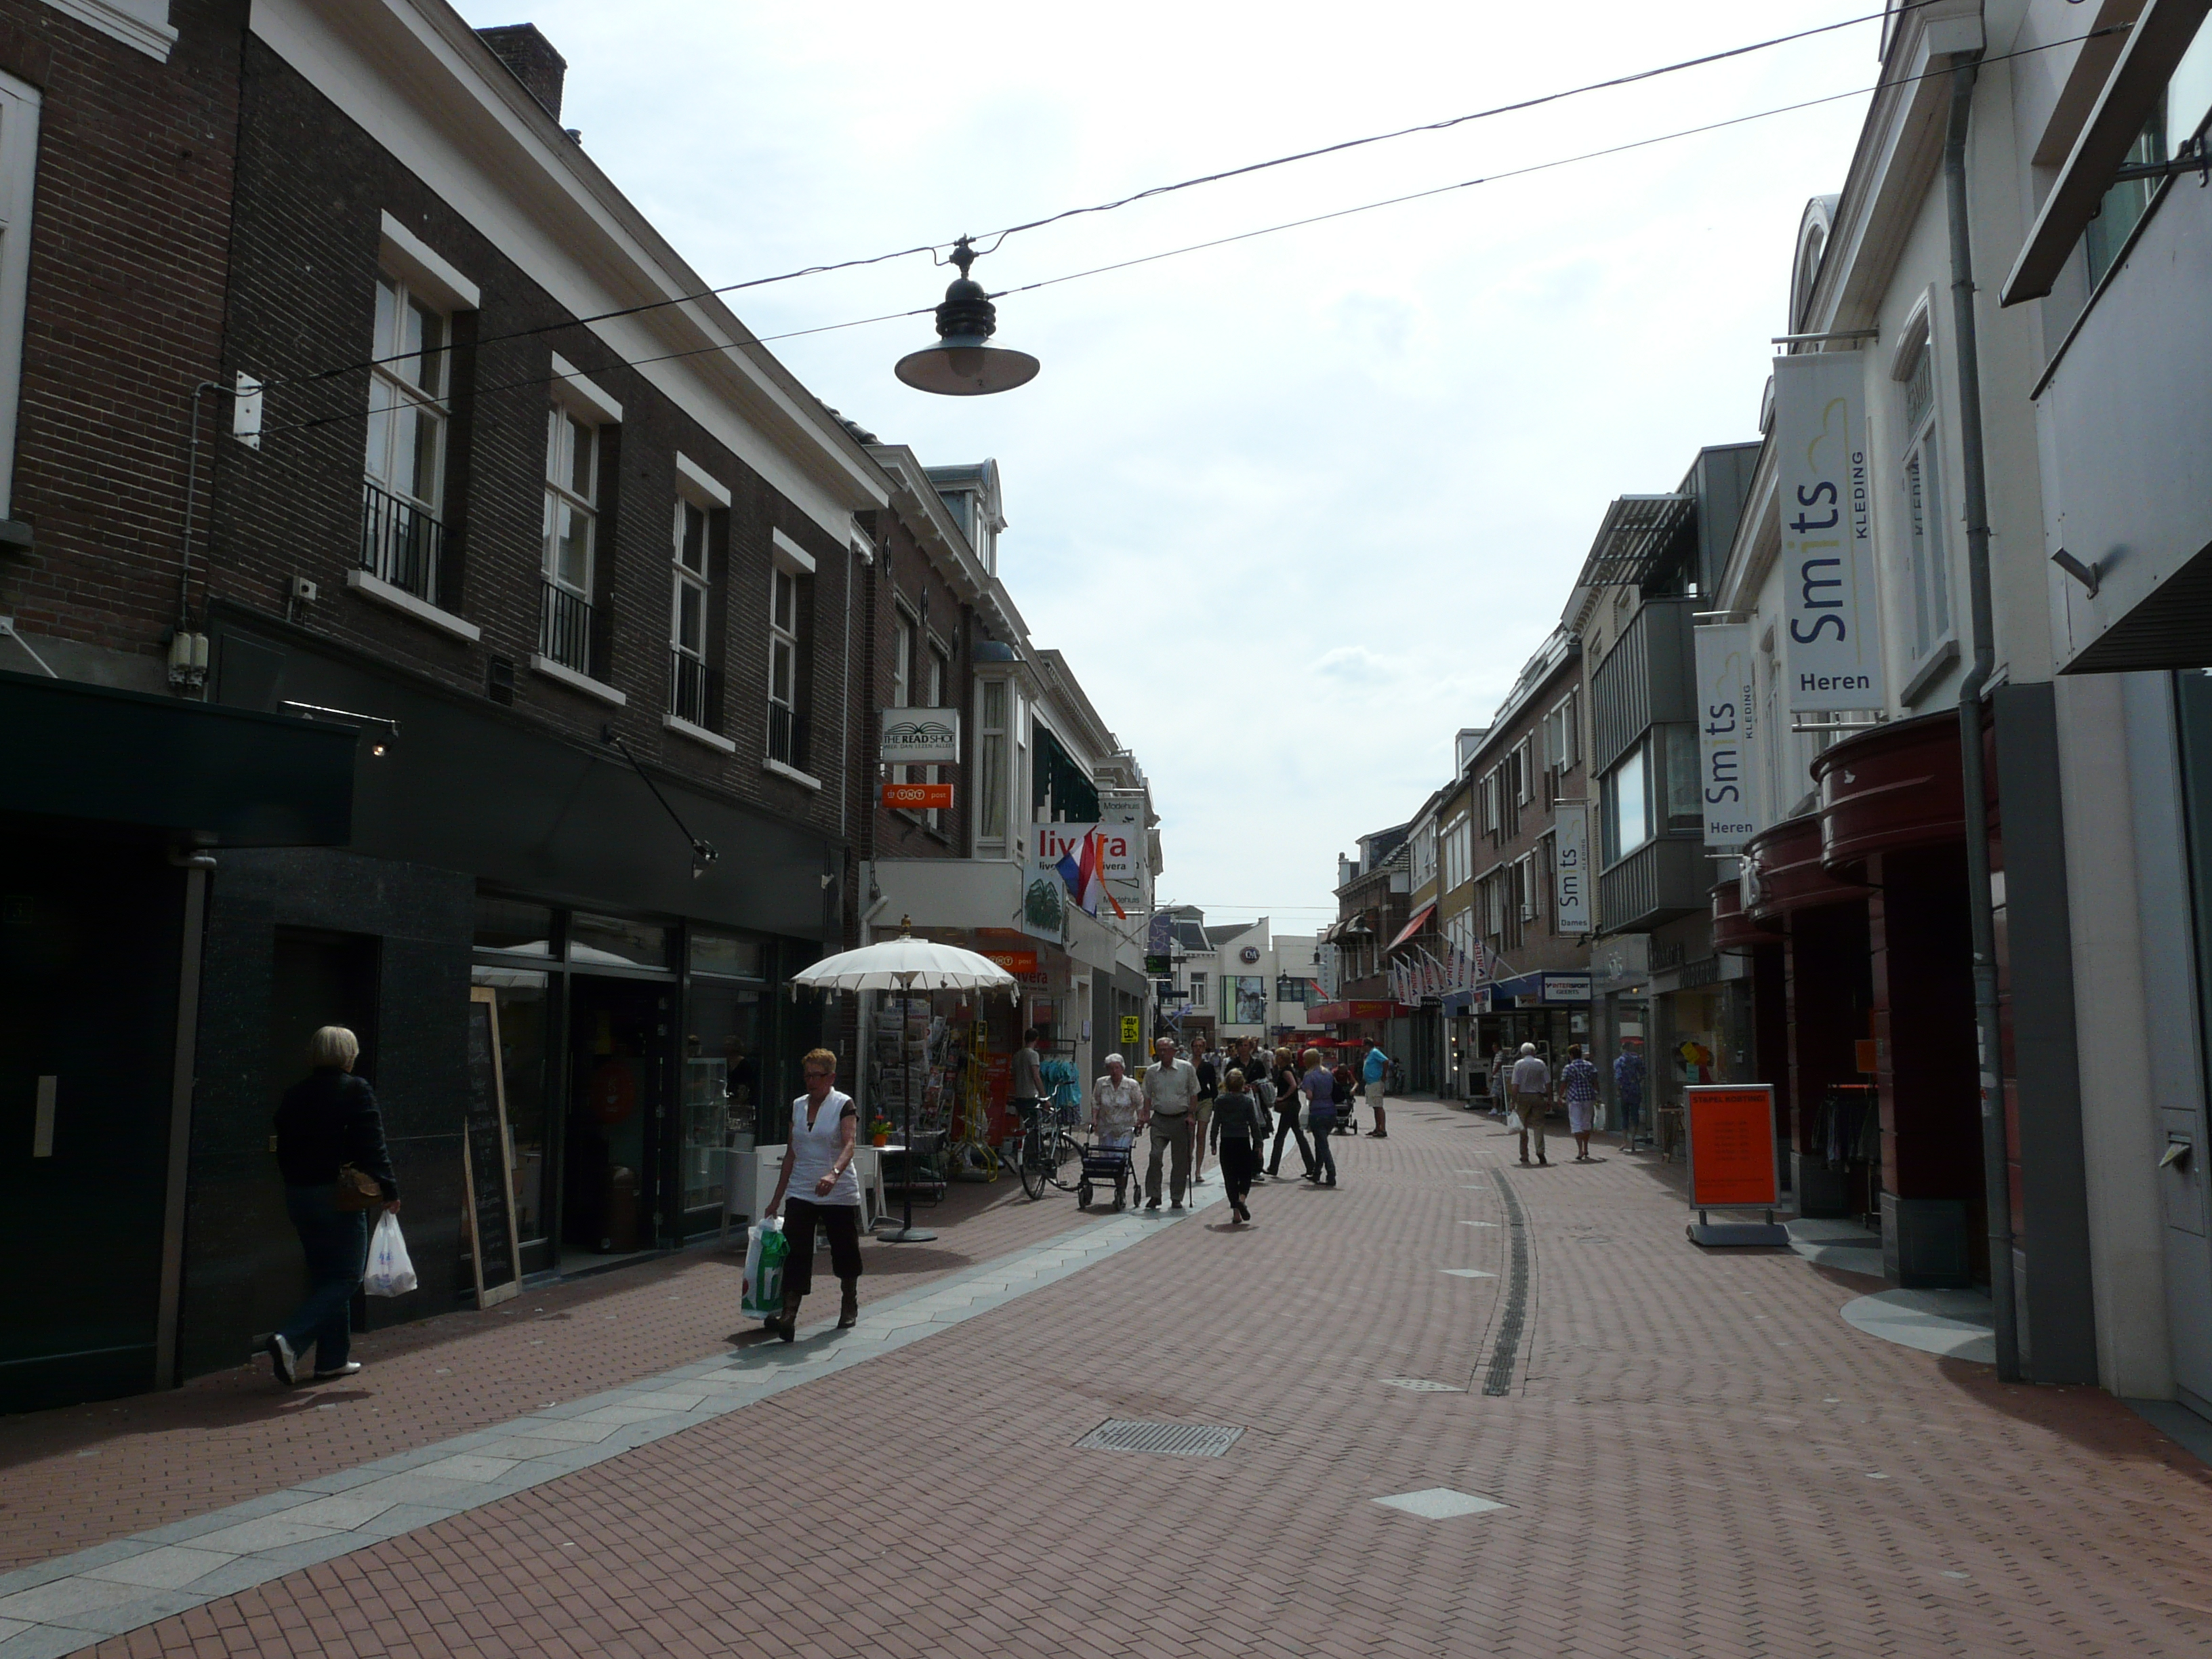 gratis date Oosterhout